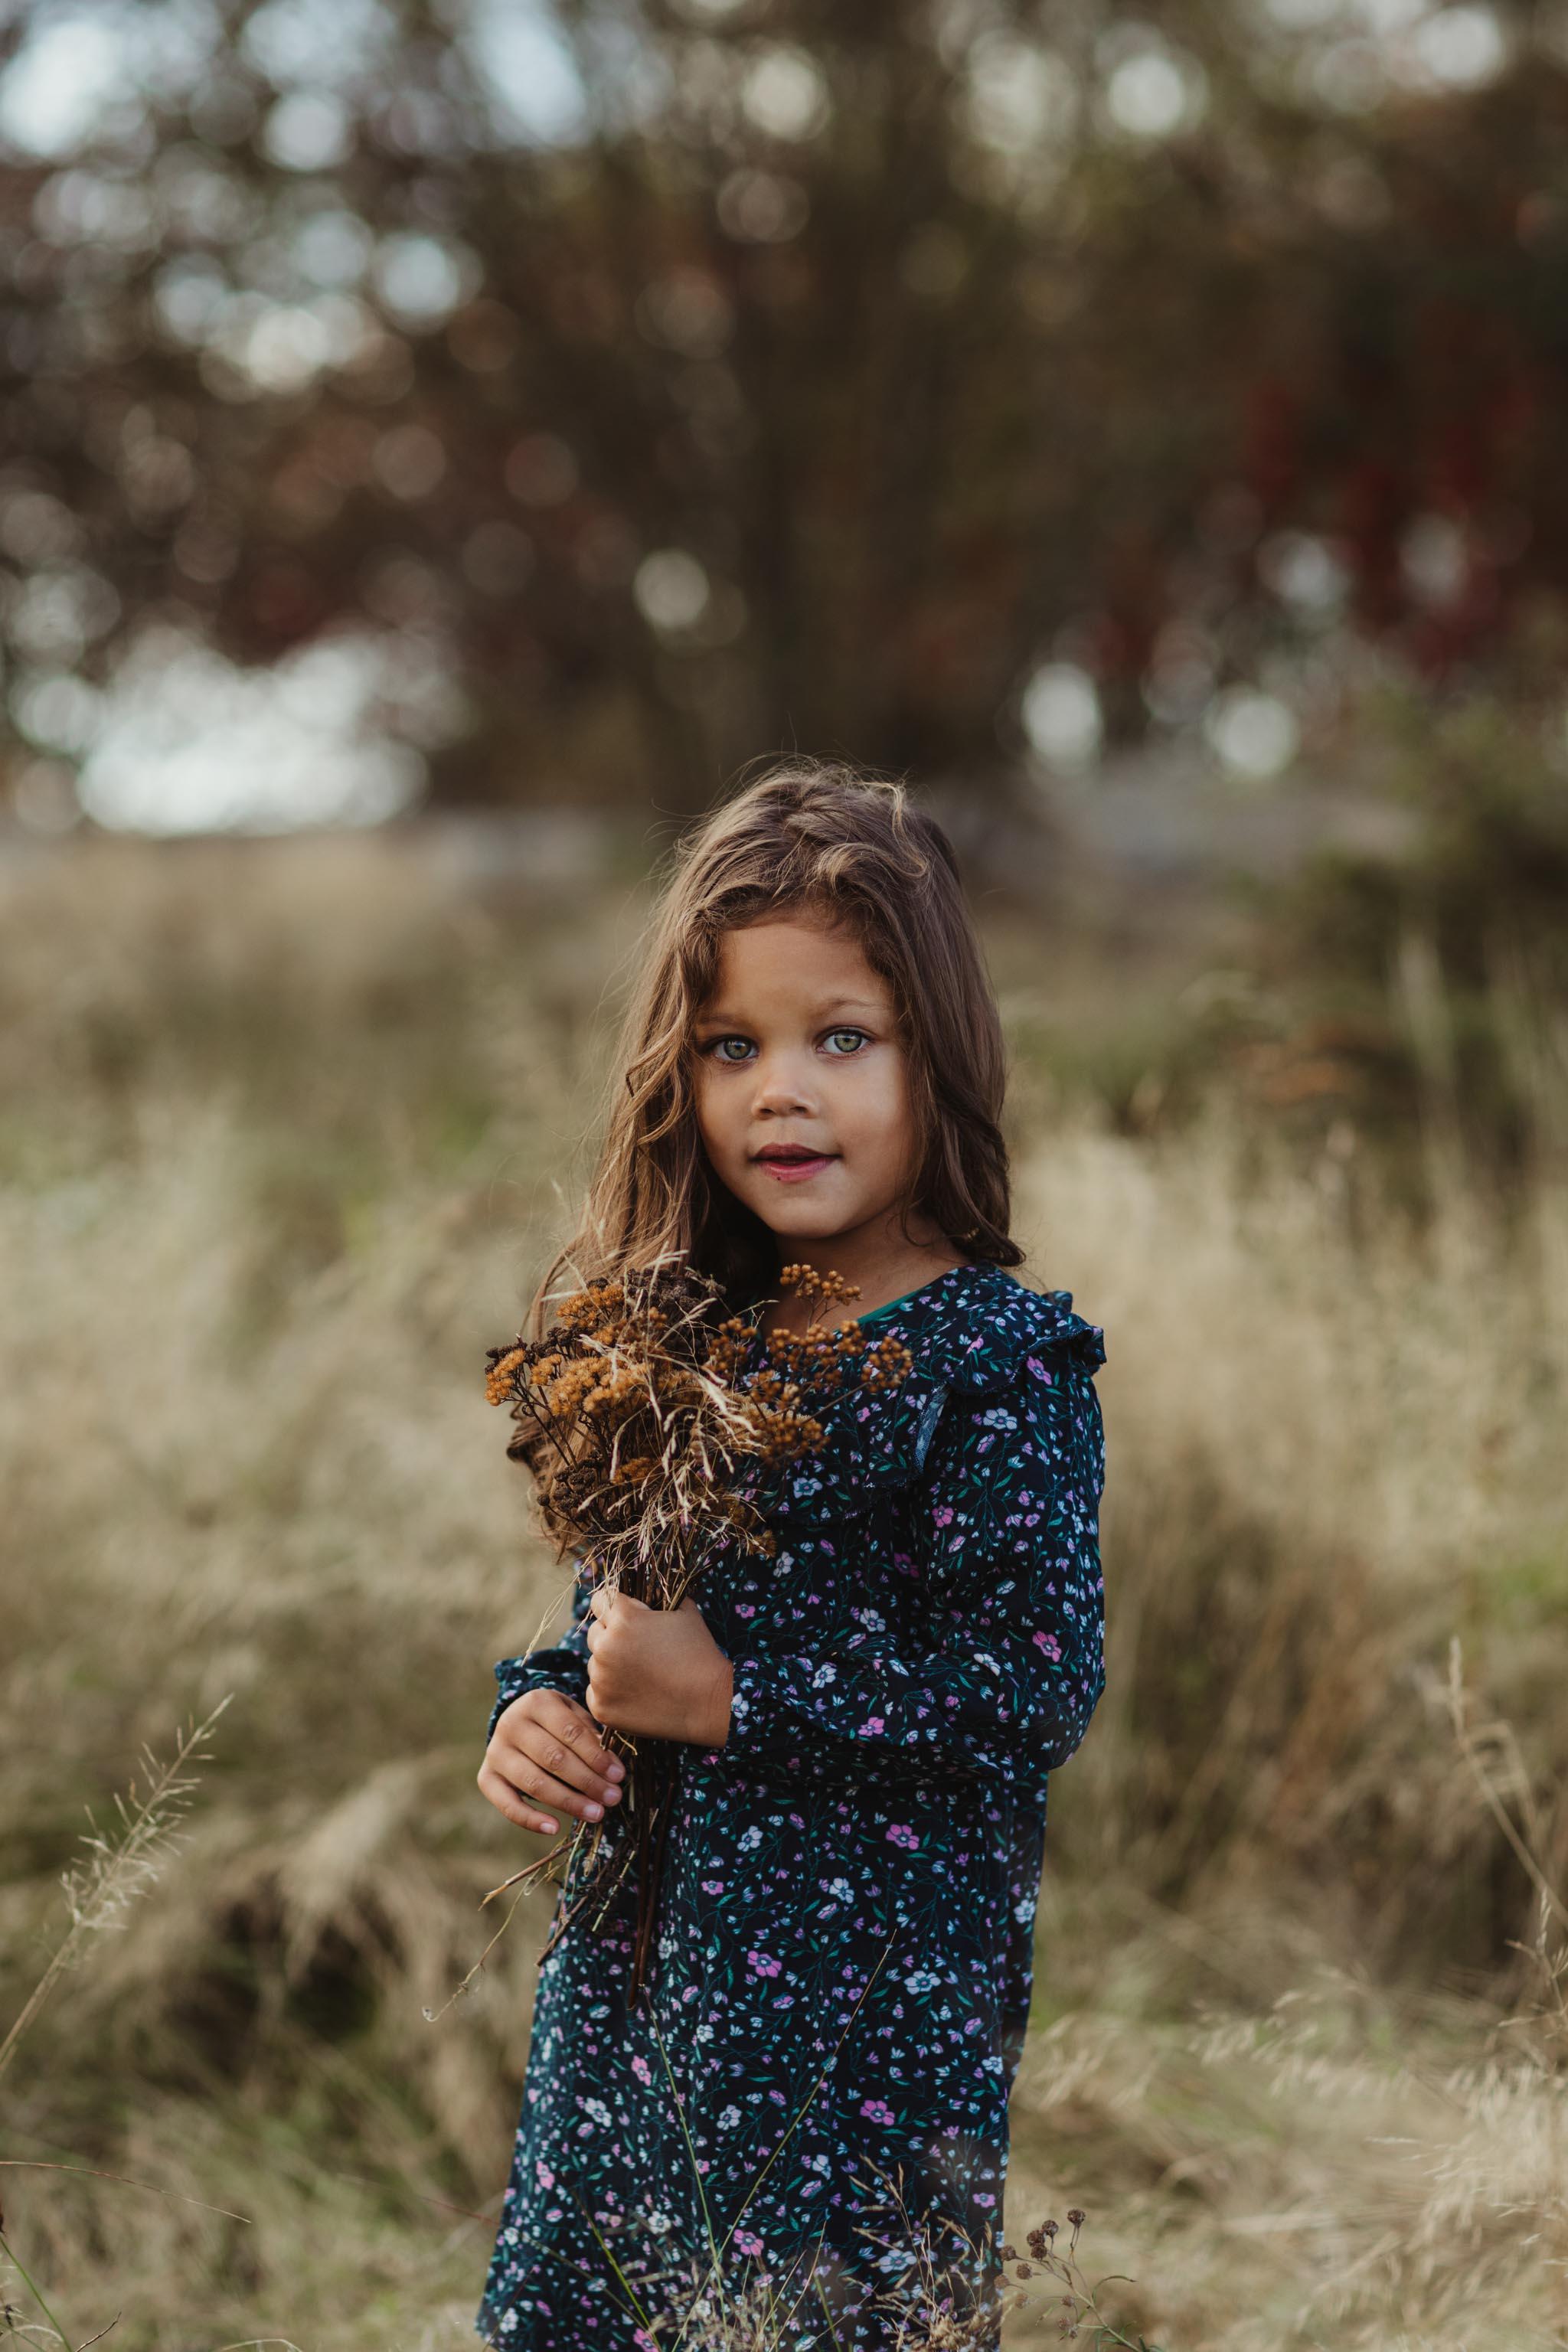 Barnefotografering - Natur, natur, lys - Fotograf Ida Hvattum